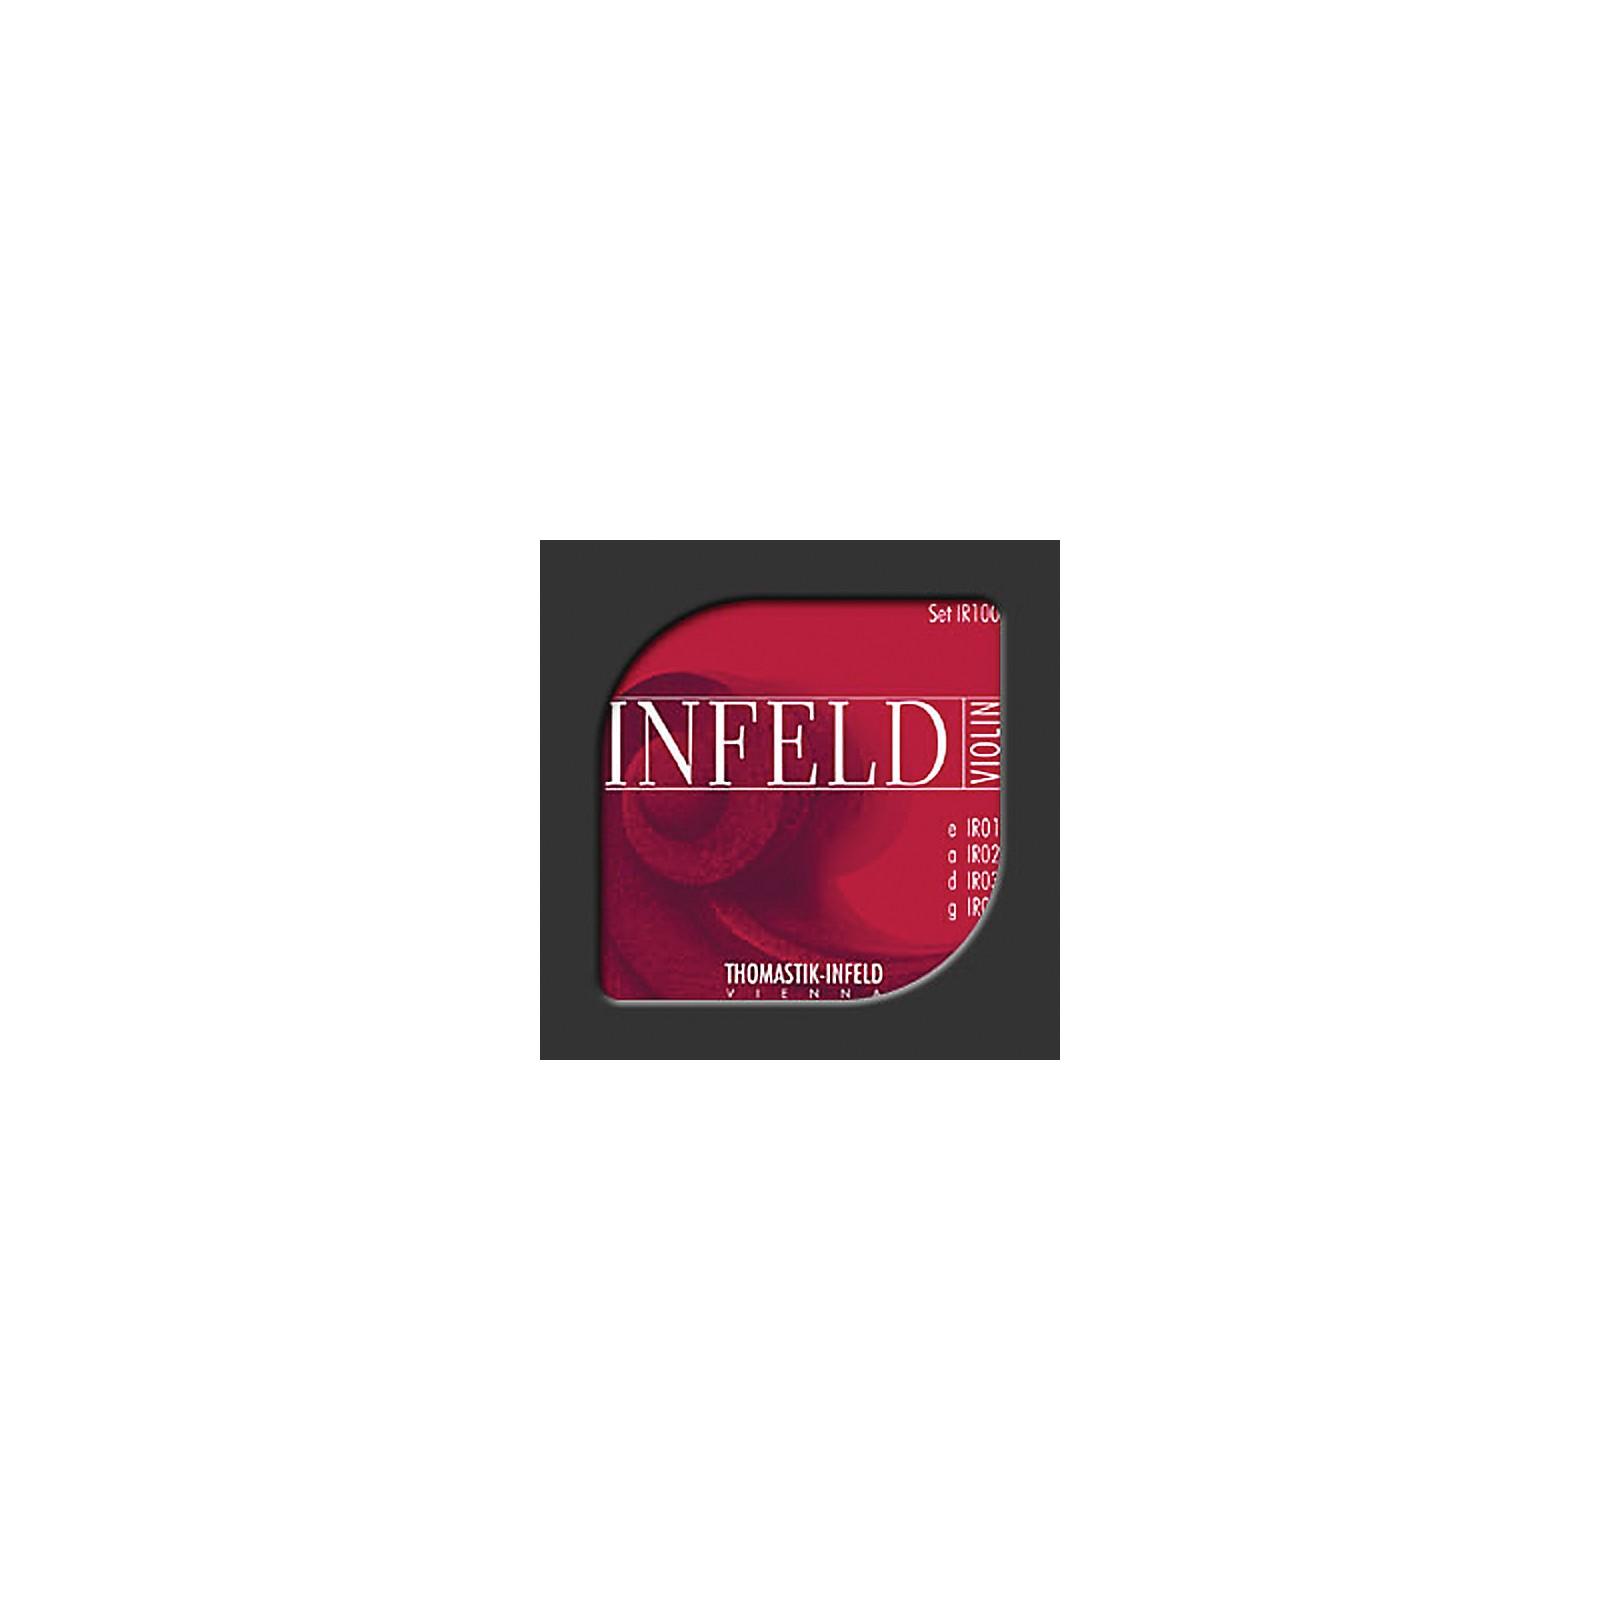 Thomastik Infeld Red Series 4/4 Size Violin Strings